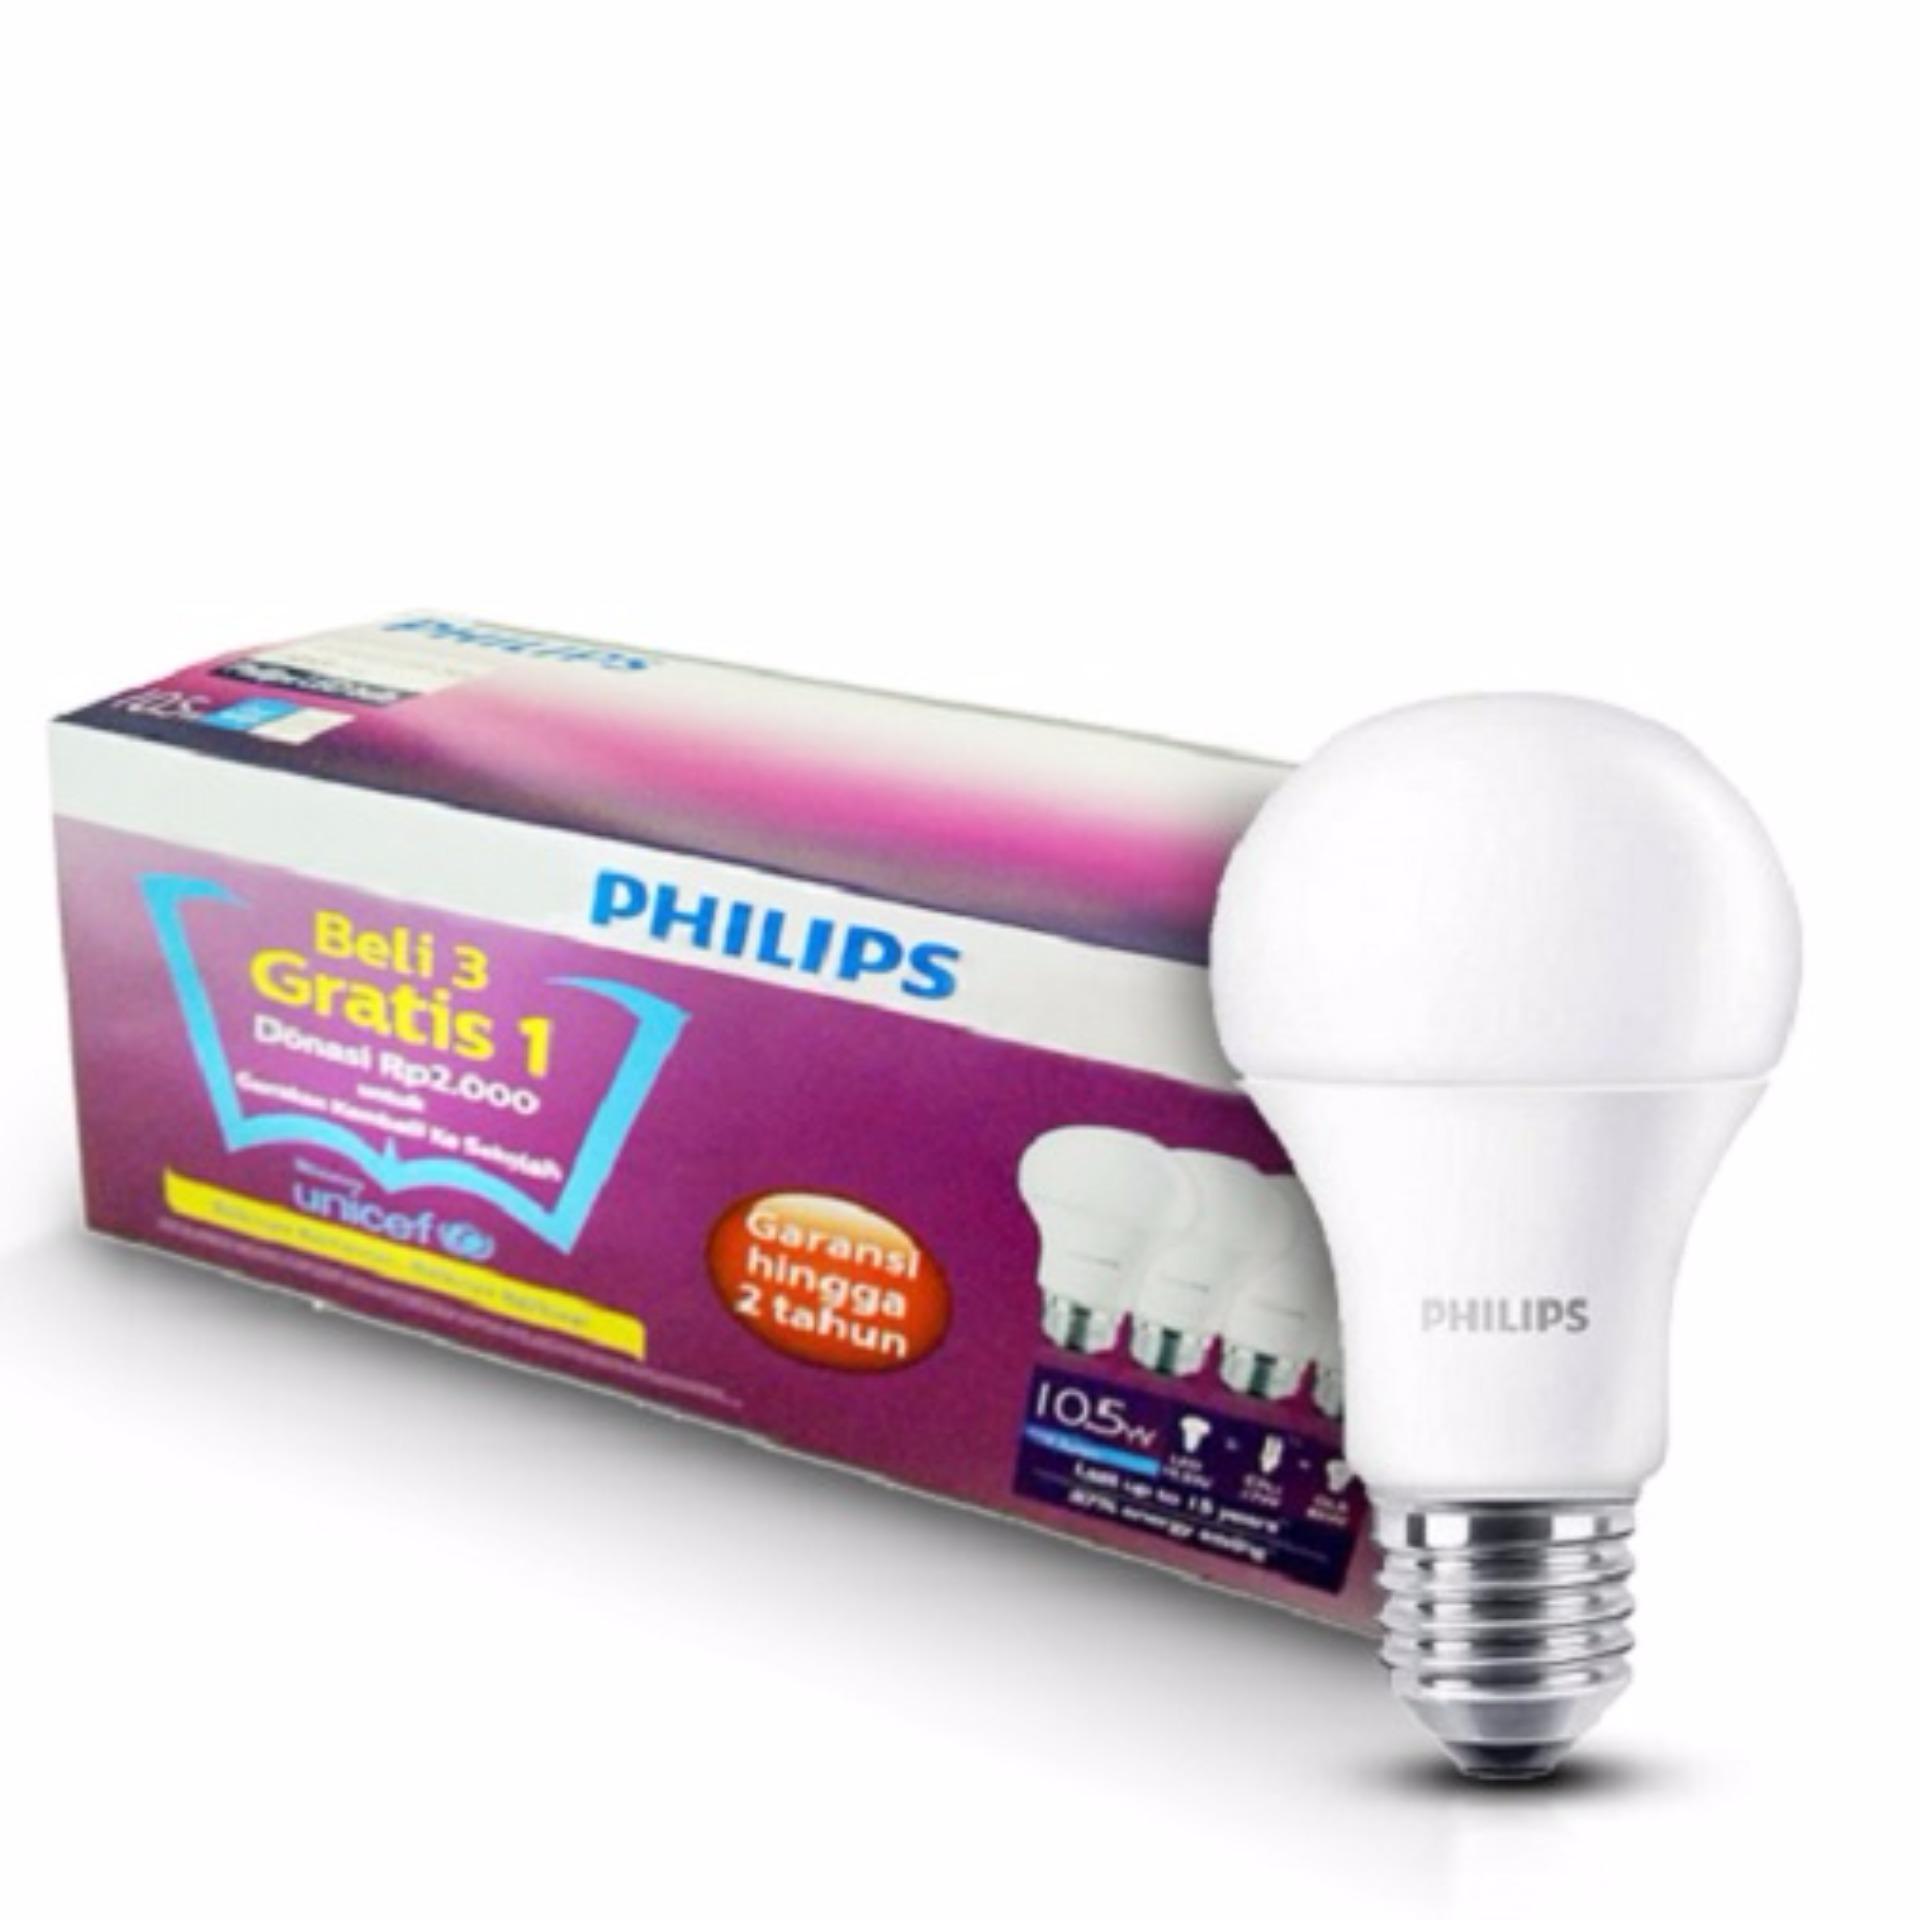 Philips Led Bulb 10 5W Unicef Beli 3 Gratis 1 Putih Promo Beli 1 Gratis 1